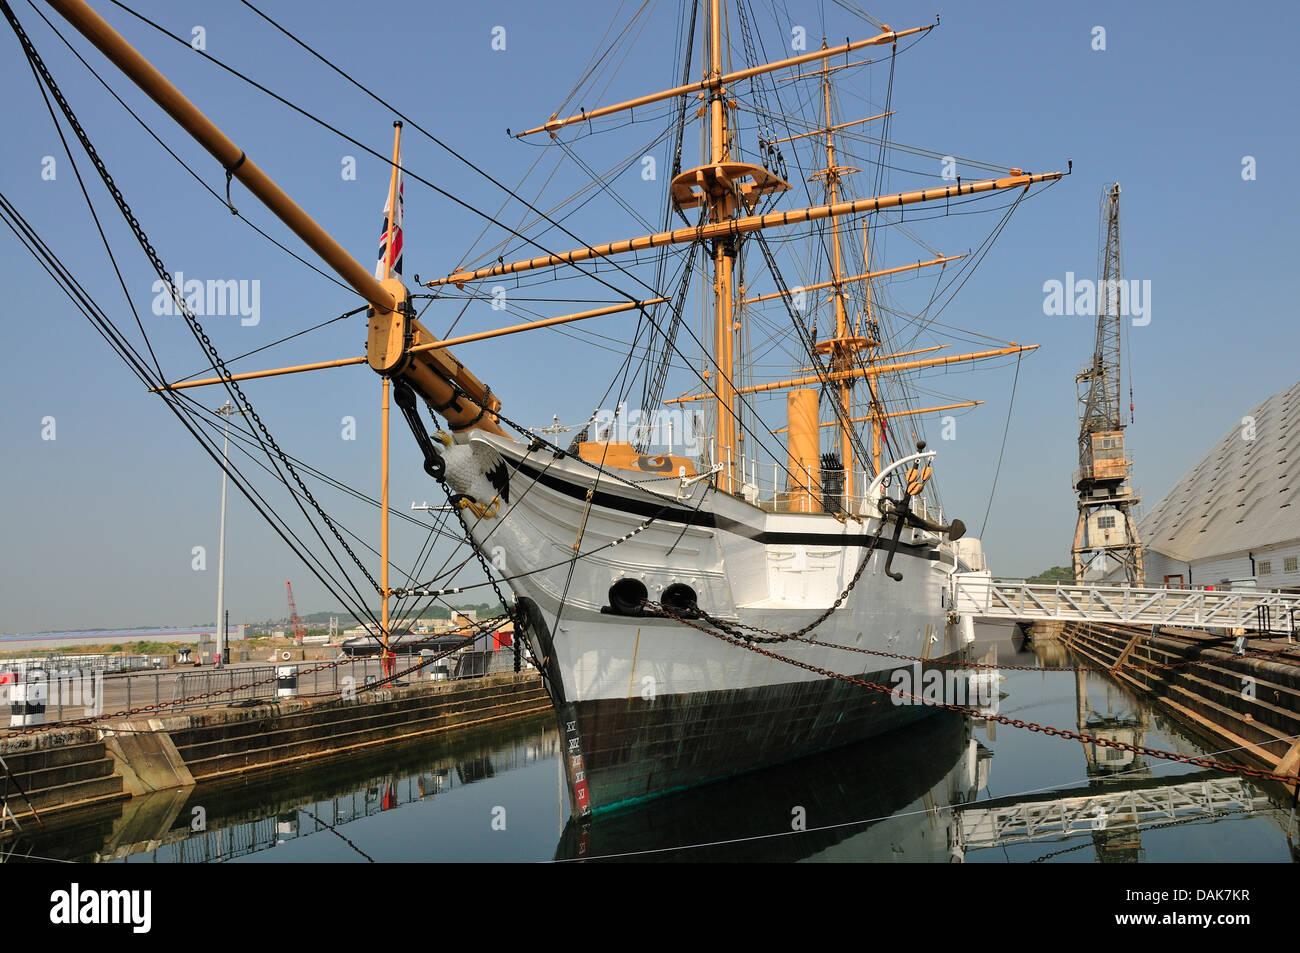 Chatham, Kent, England. Chatham Historic Dockyard. HMS Gannet (1878) - Stock Image